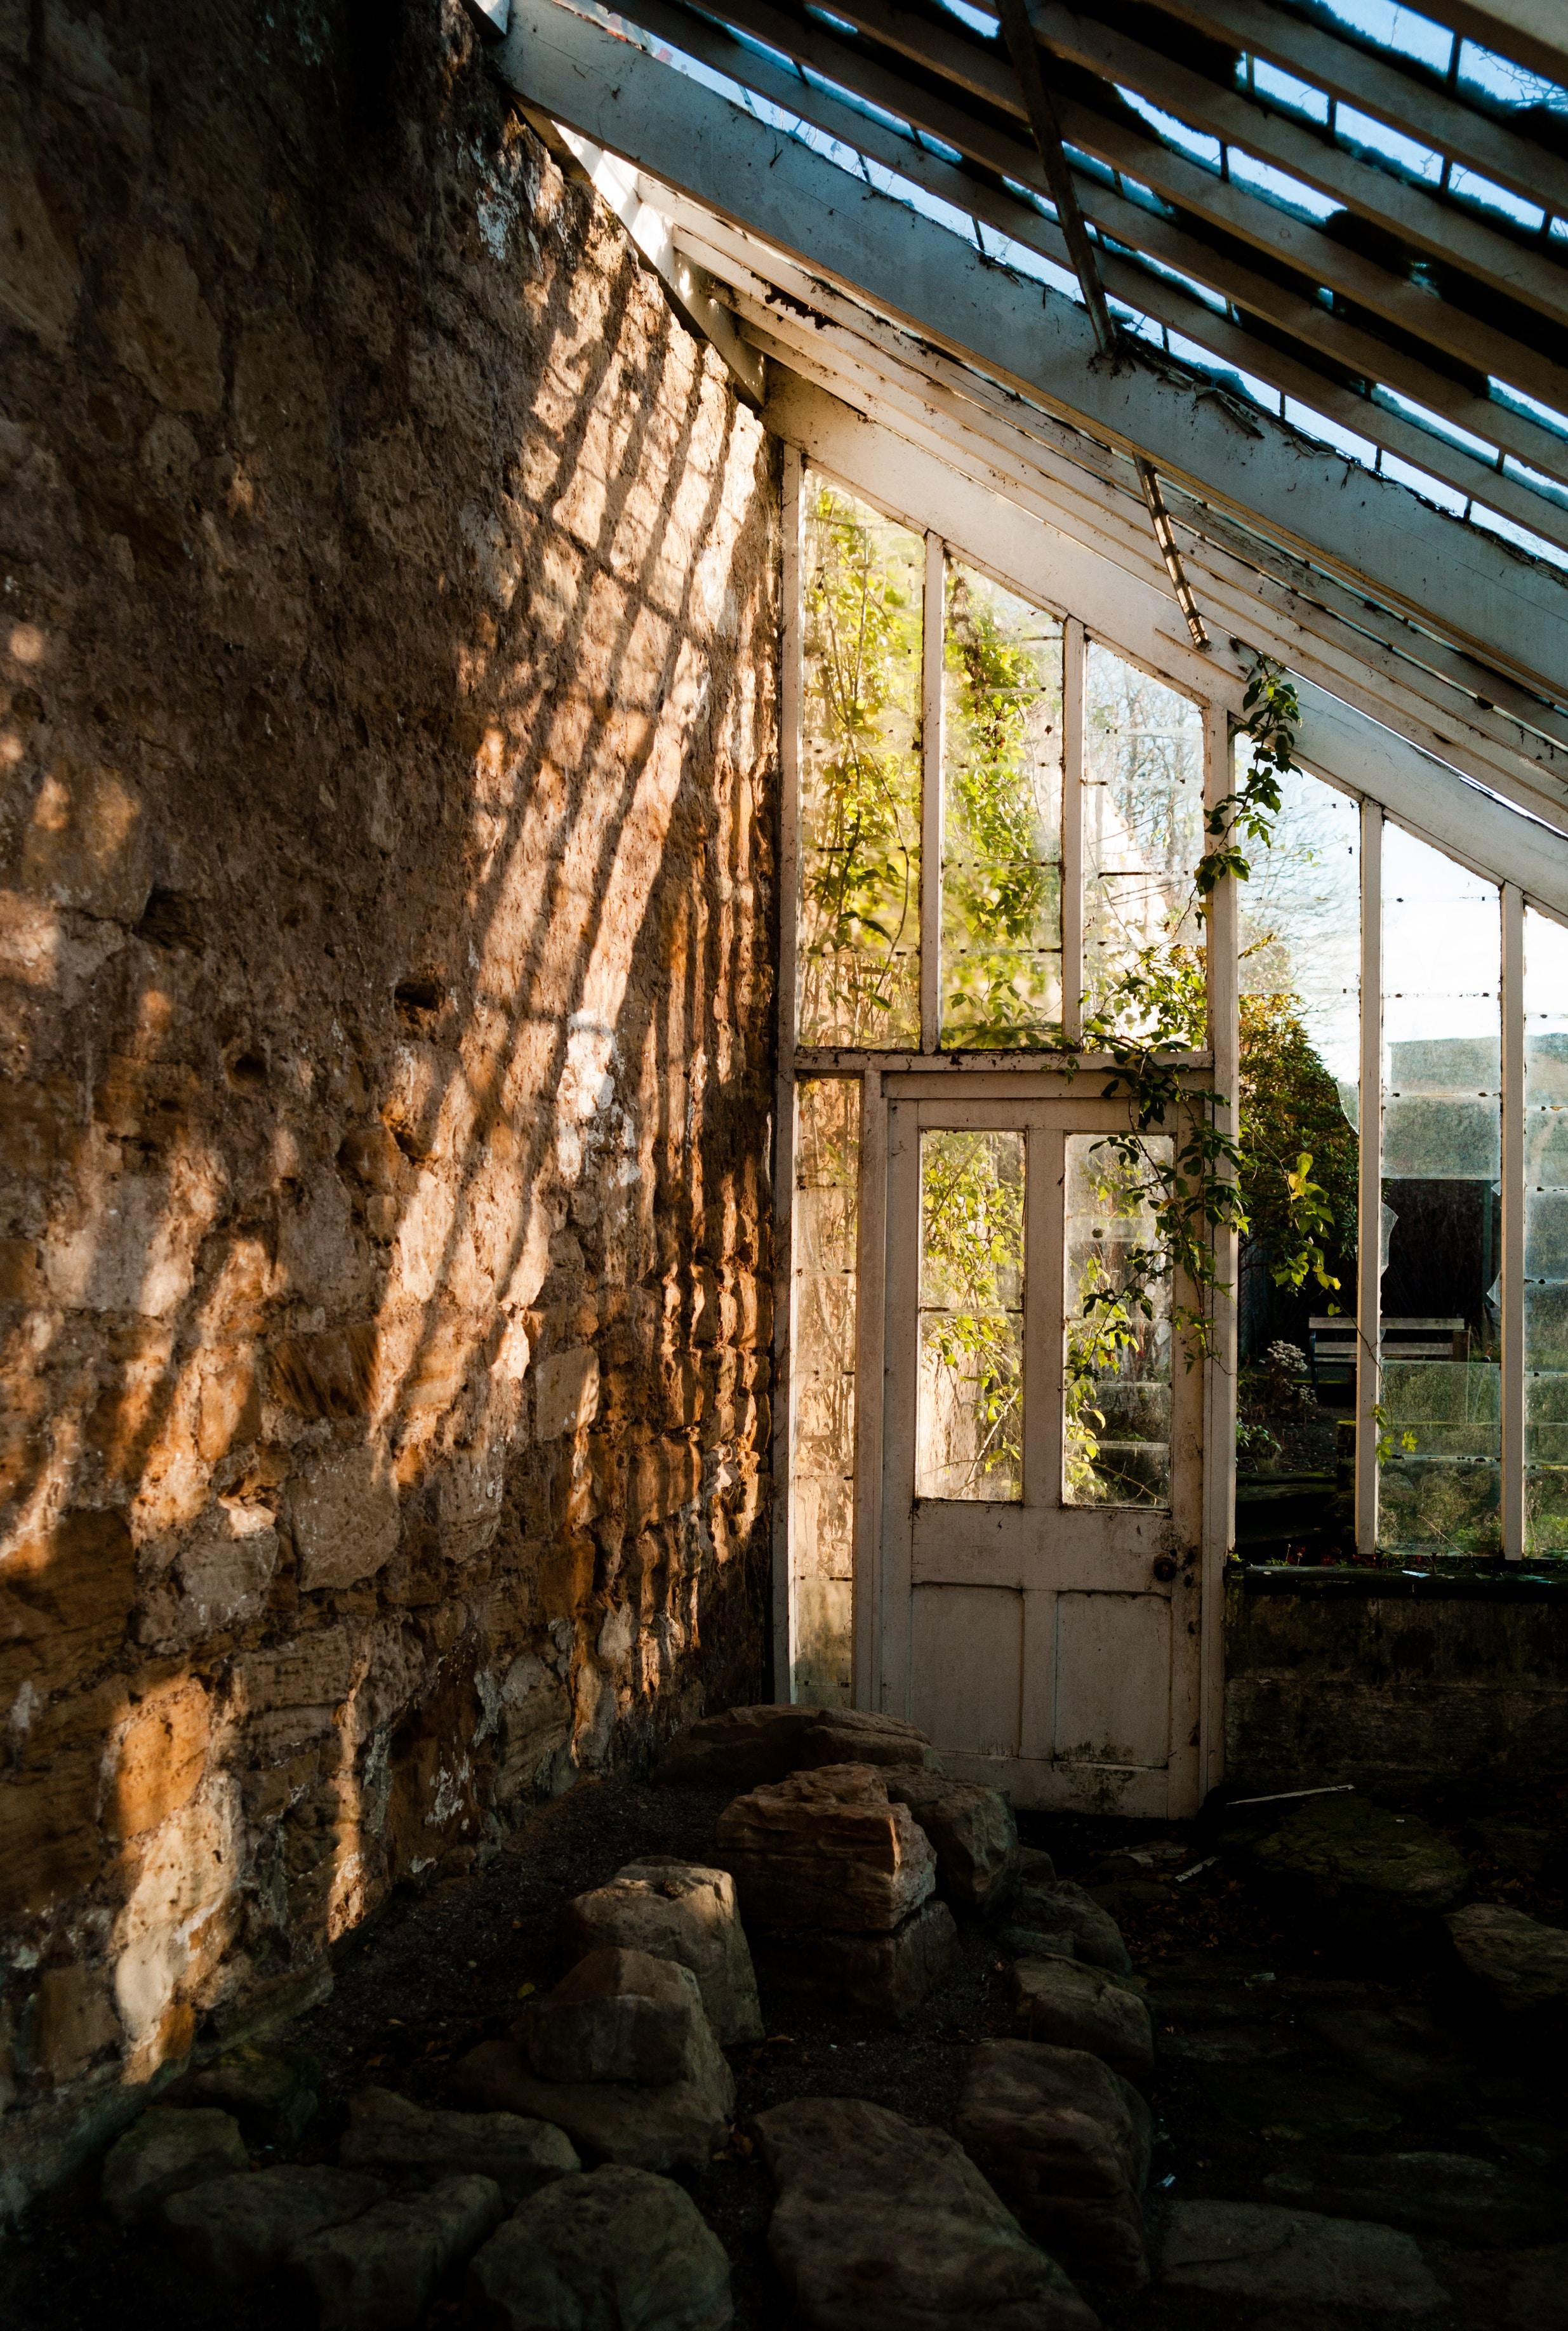 empty abandoned house at daytime